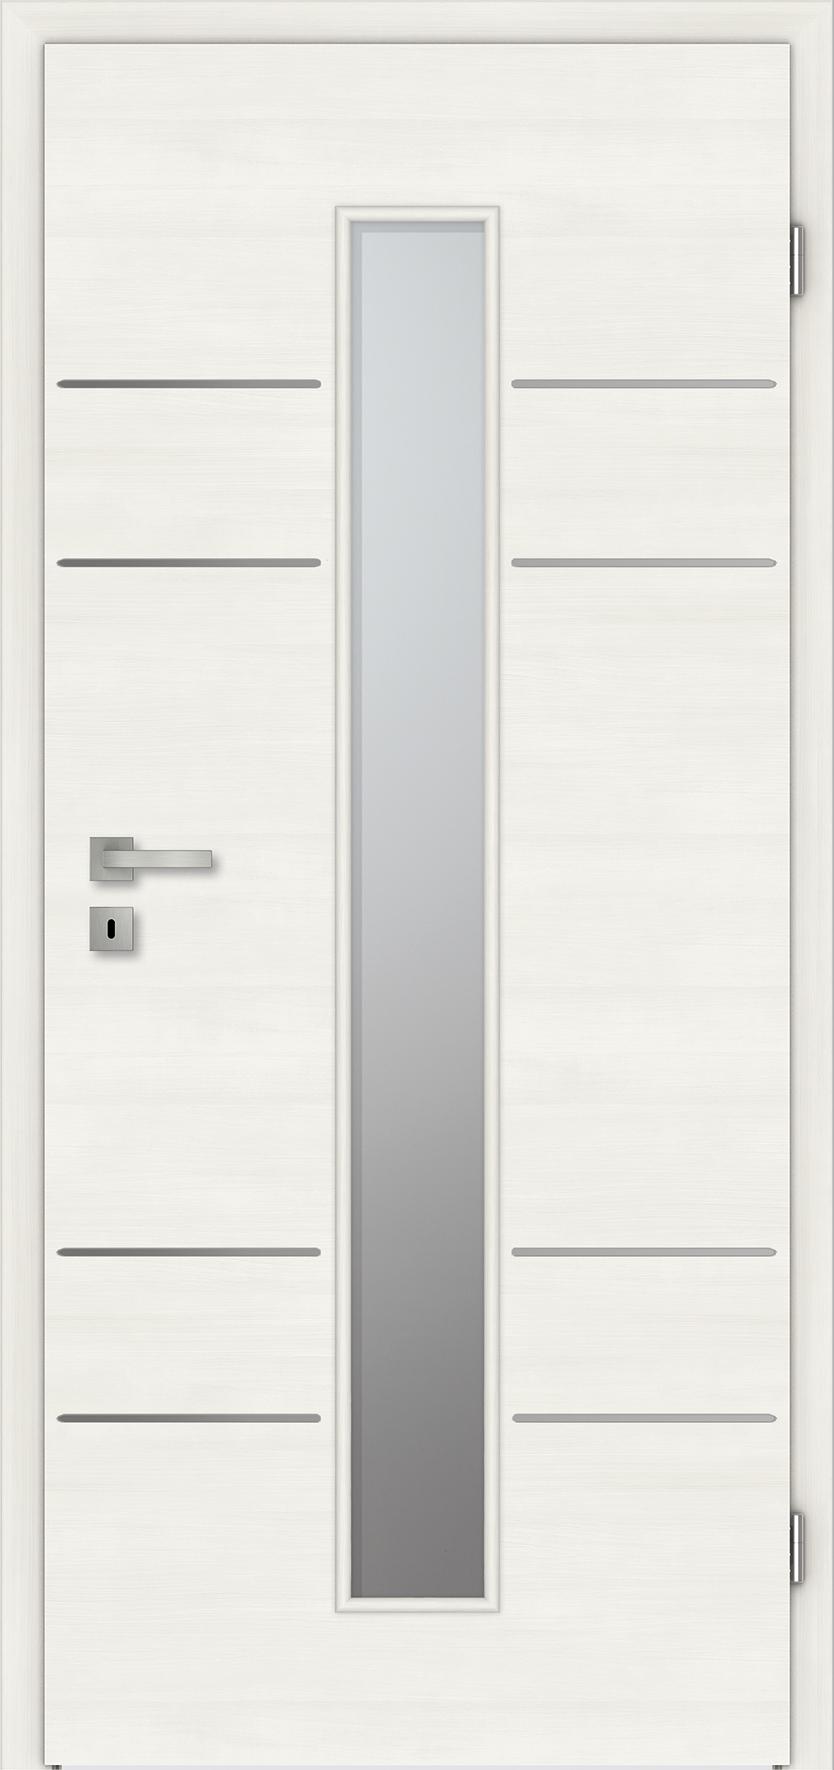 RY-552-LA2-DQ_CPL Touch Whiteline